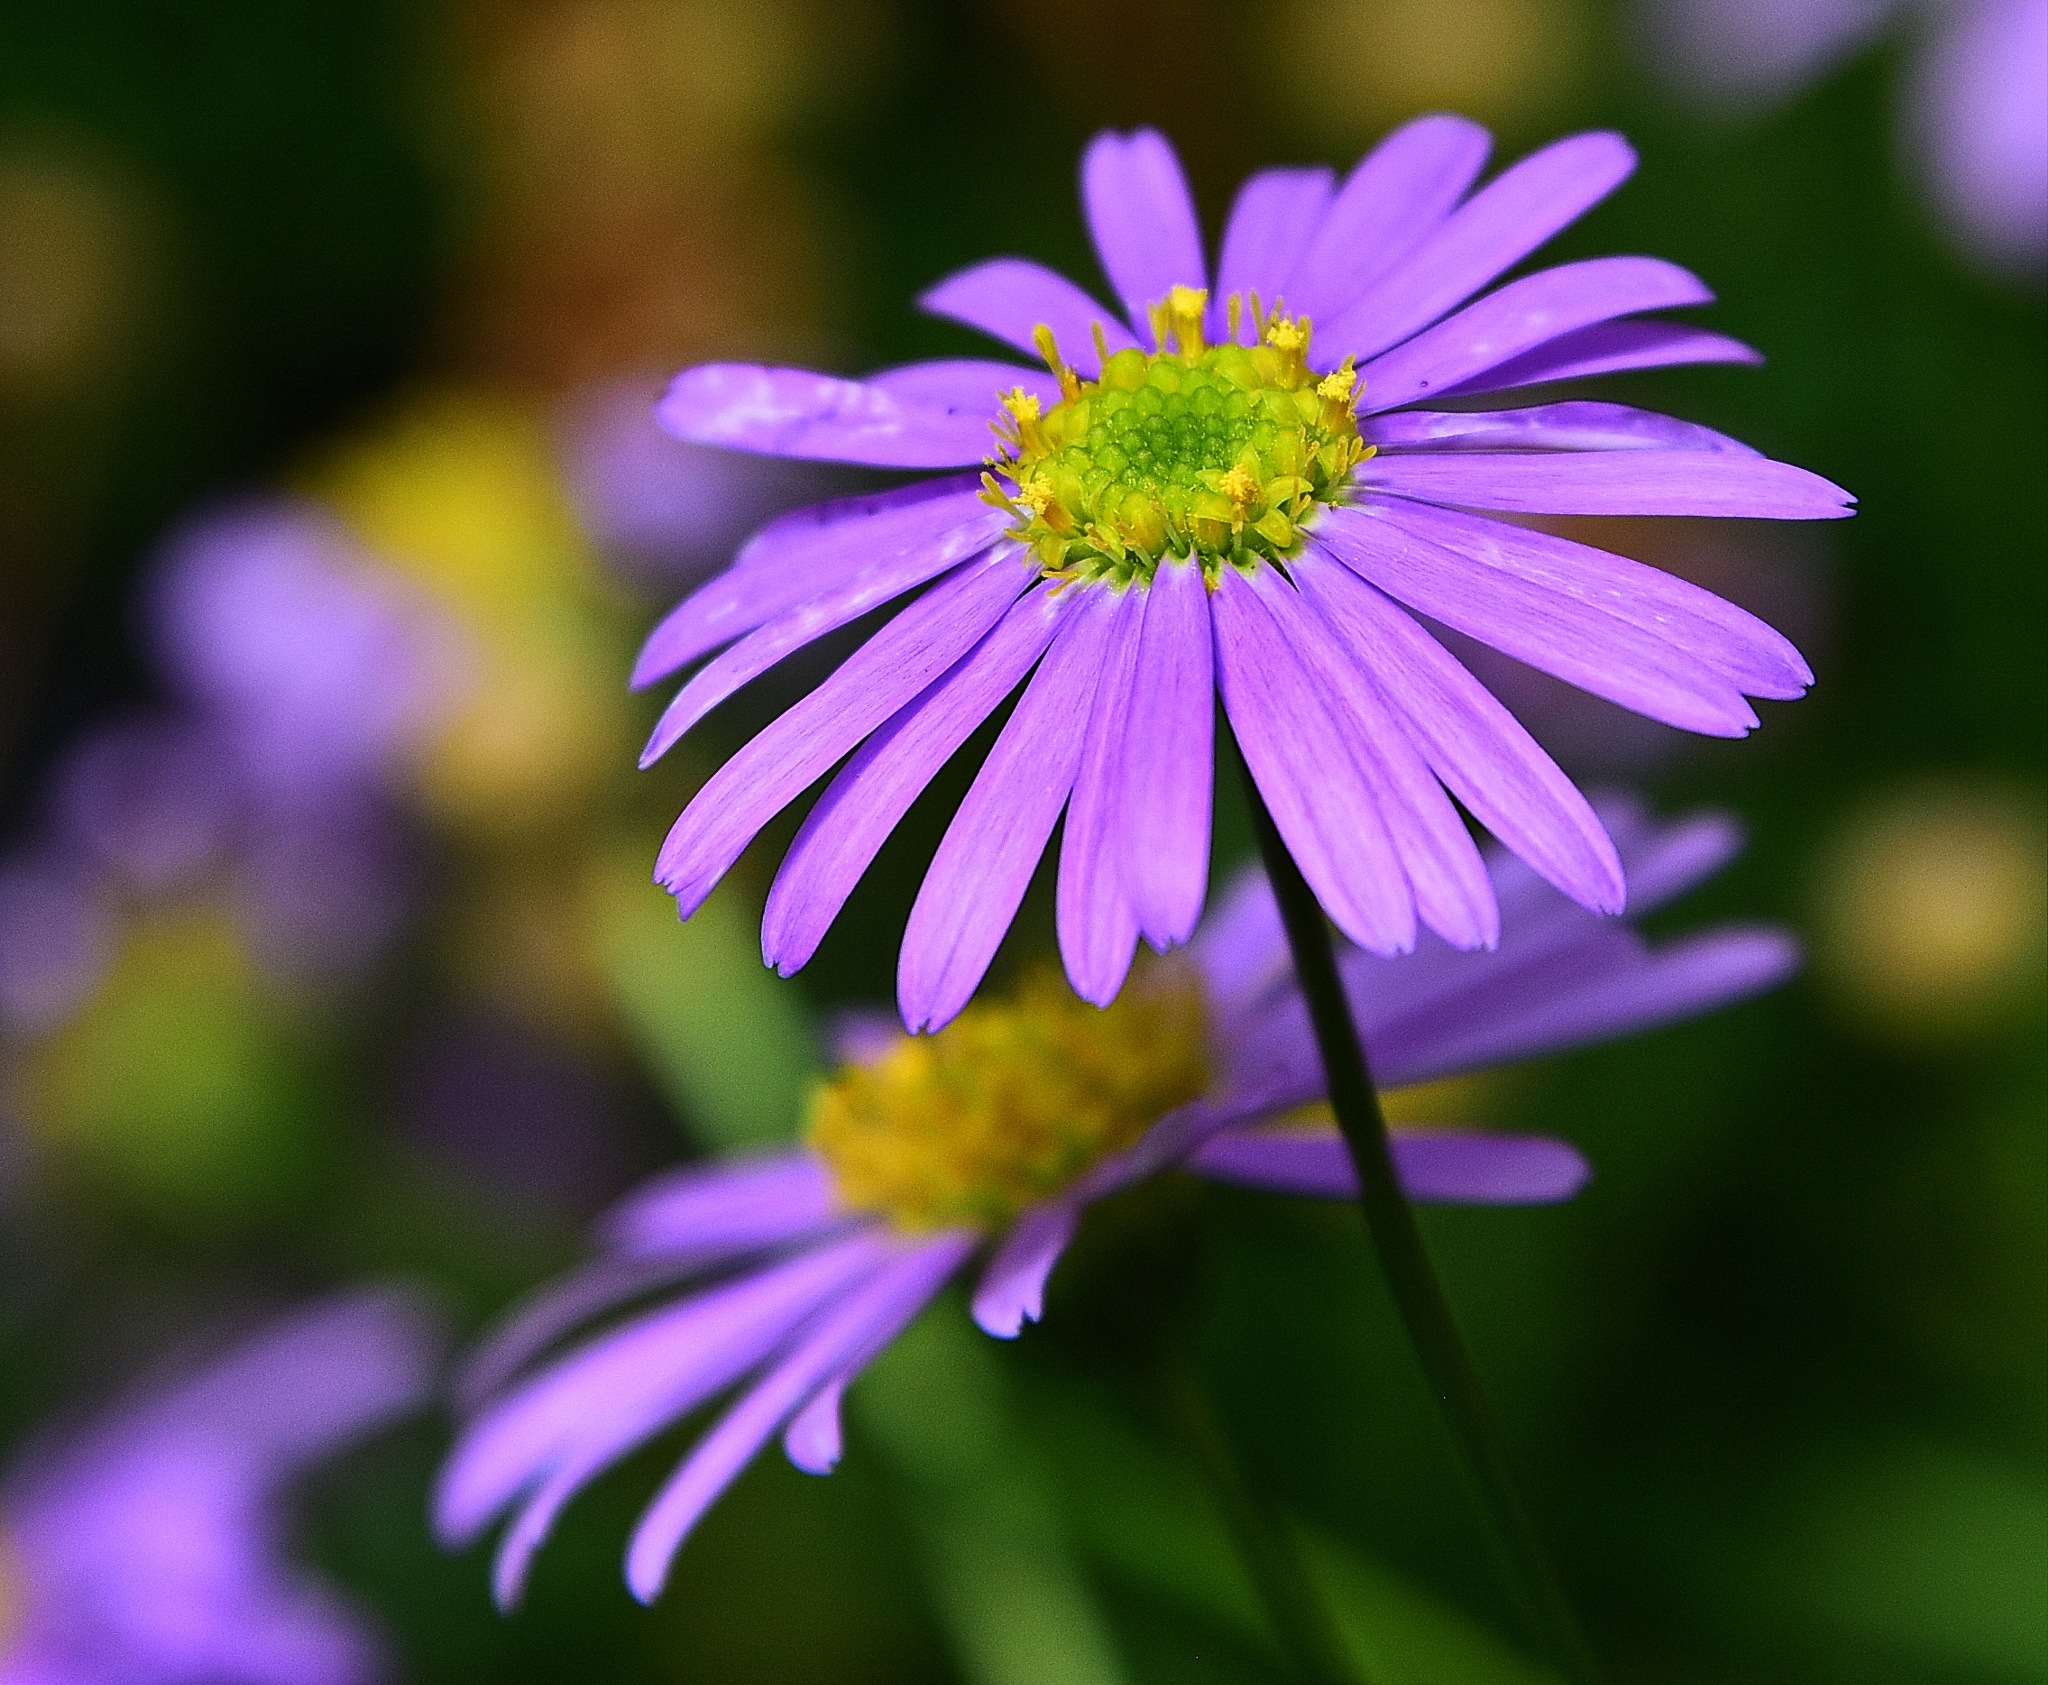 Flower by NaumanMughal